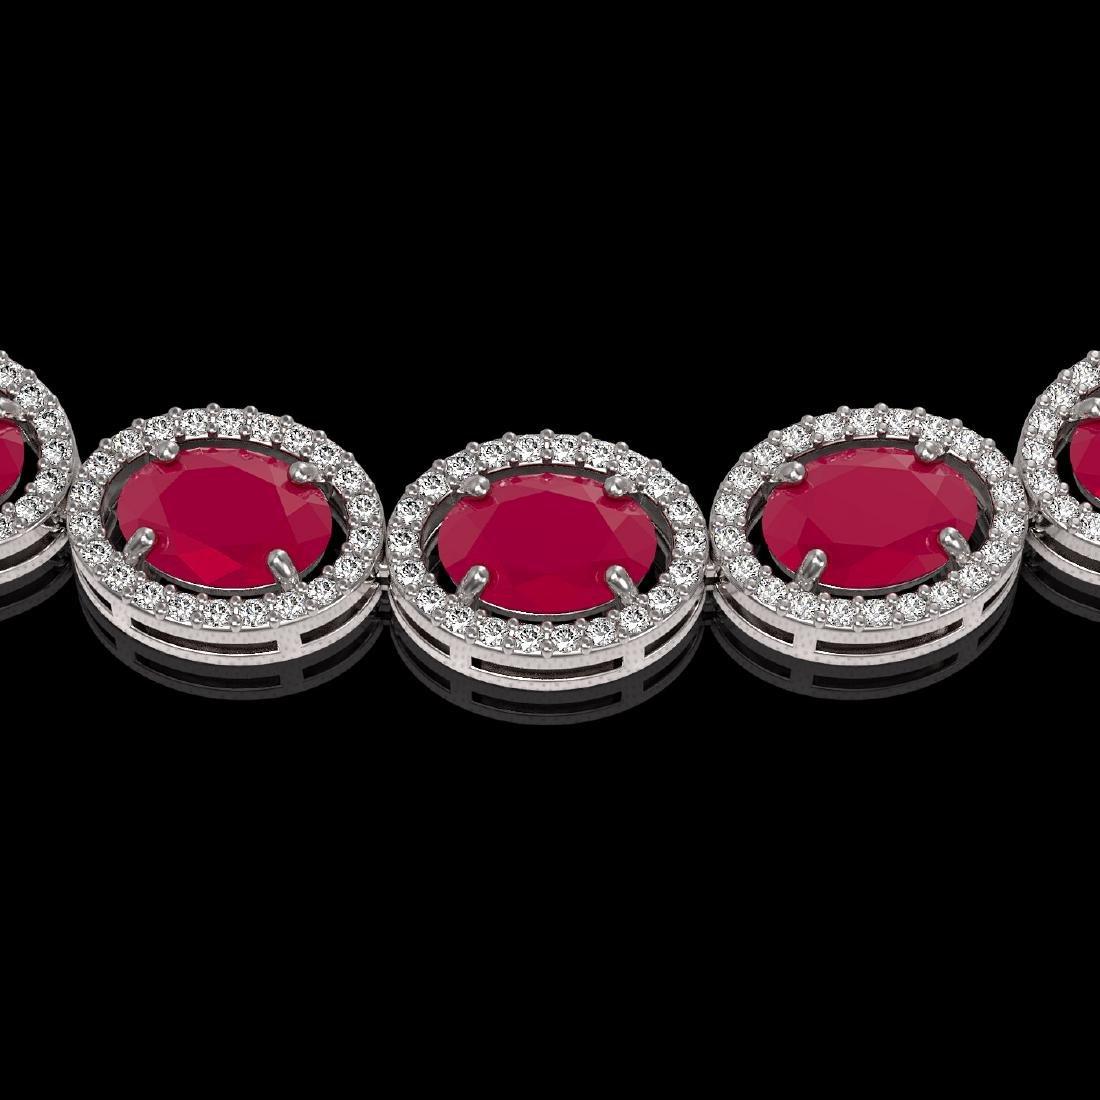 52.15 CTW Ruby & Diamond Halo Necklace 10K White Gold - 3